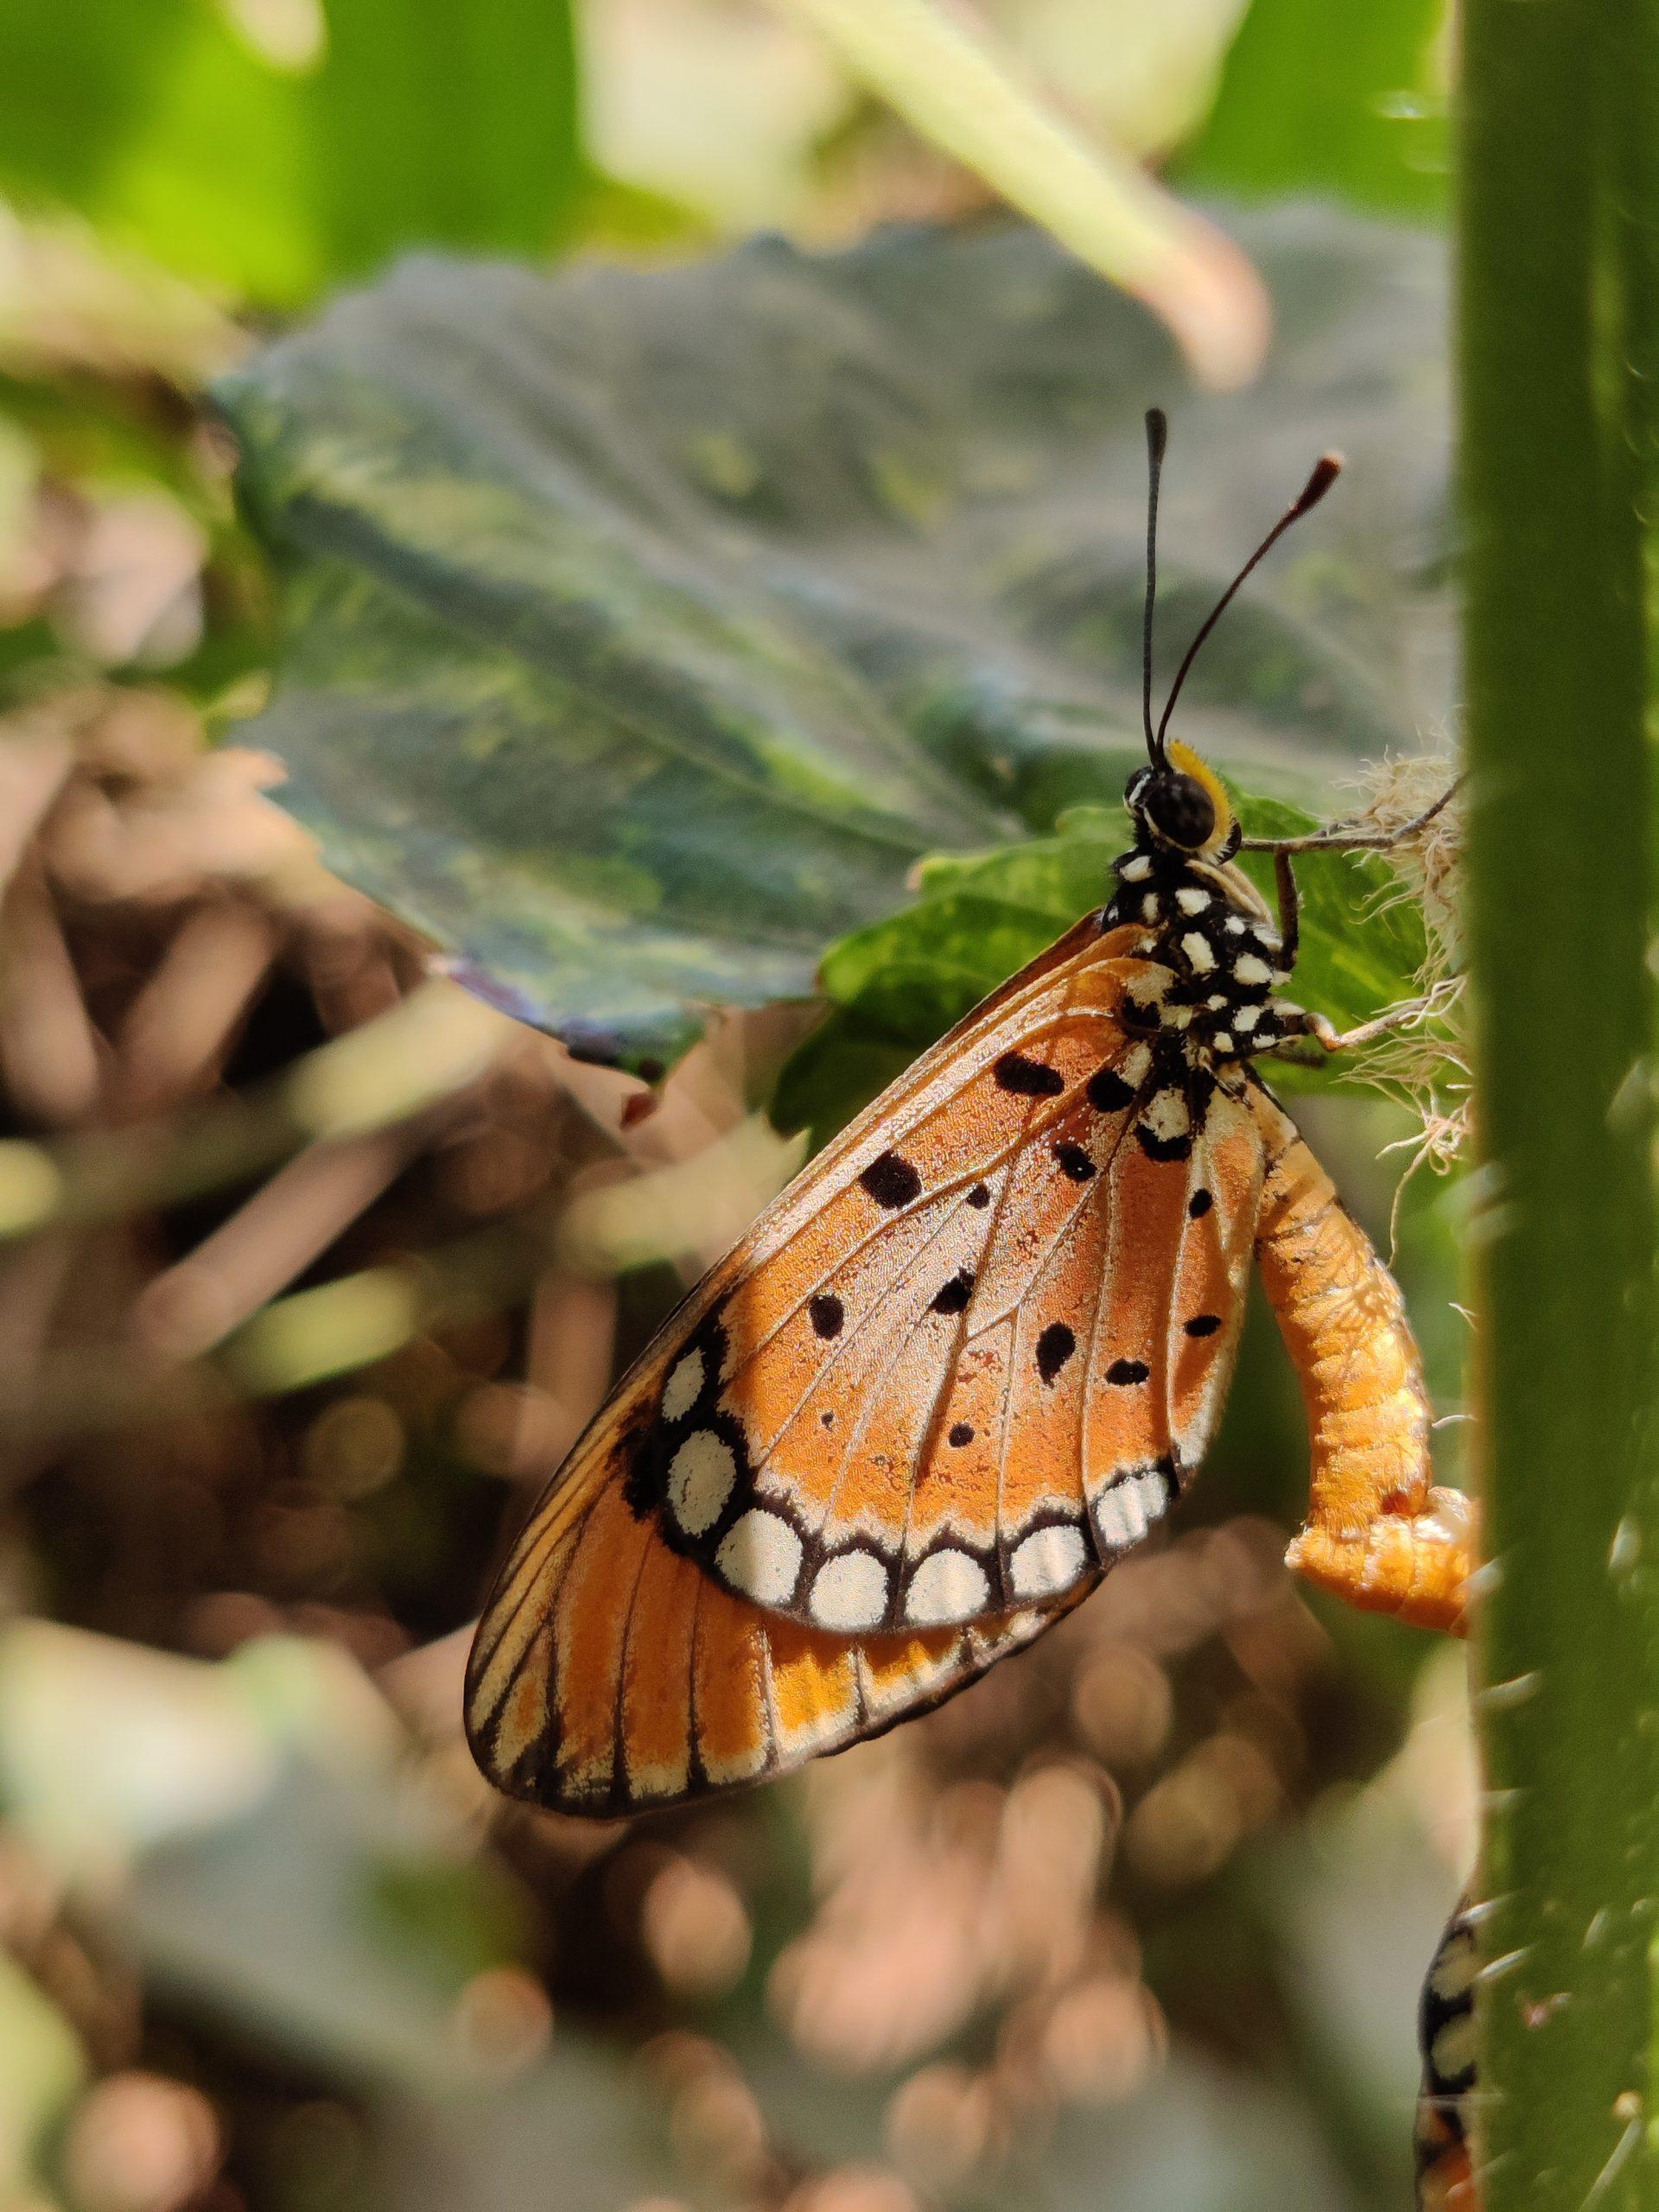 Butterfly on plant stem